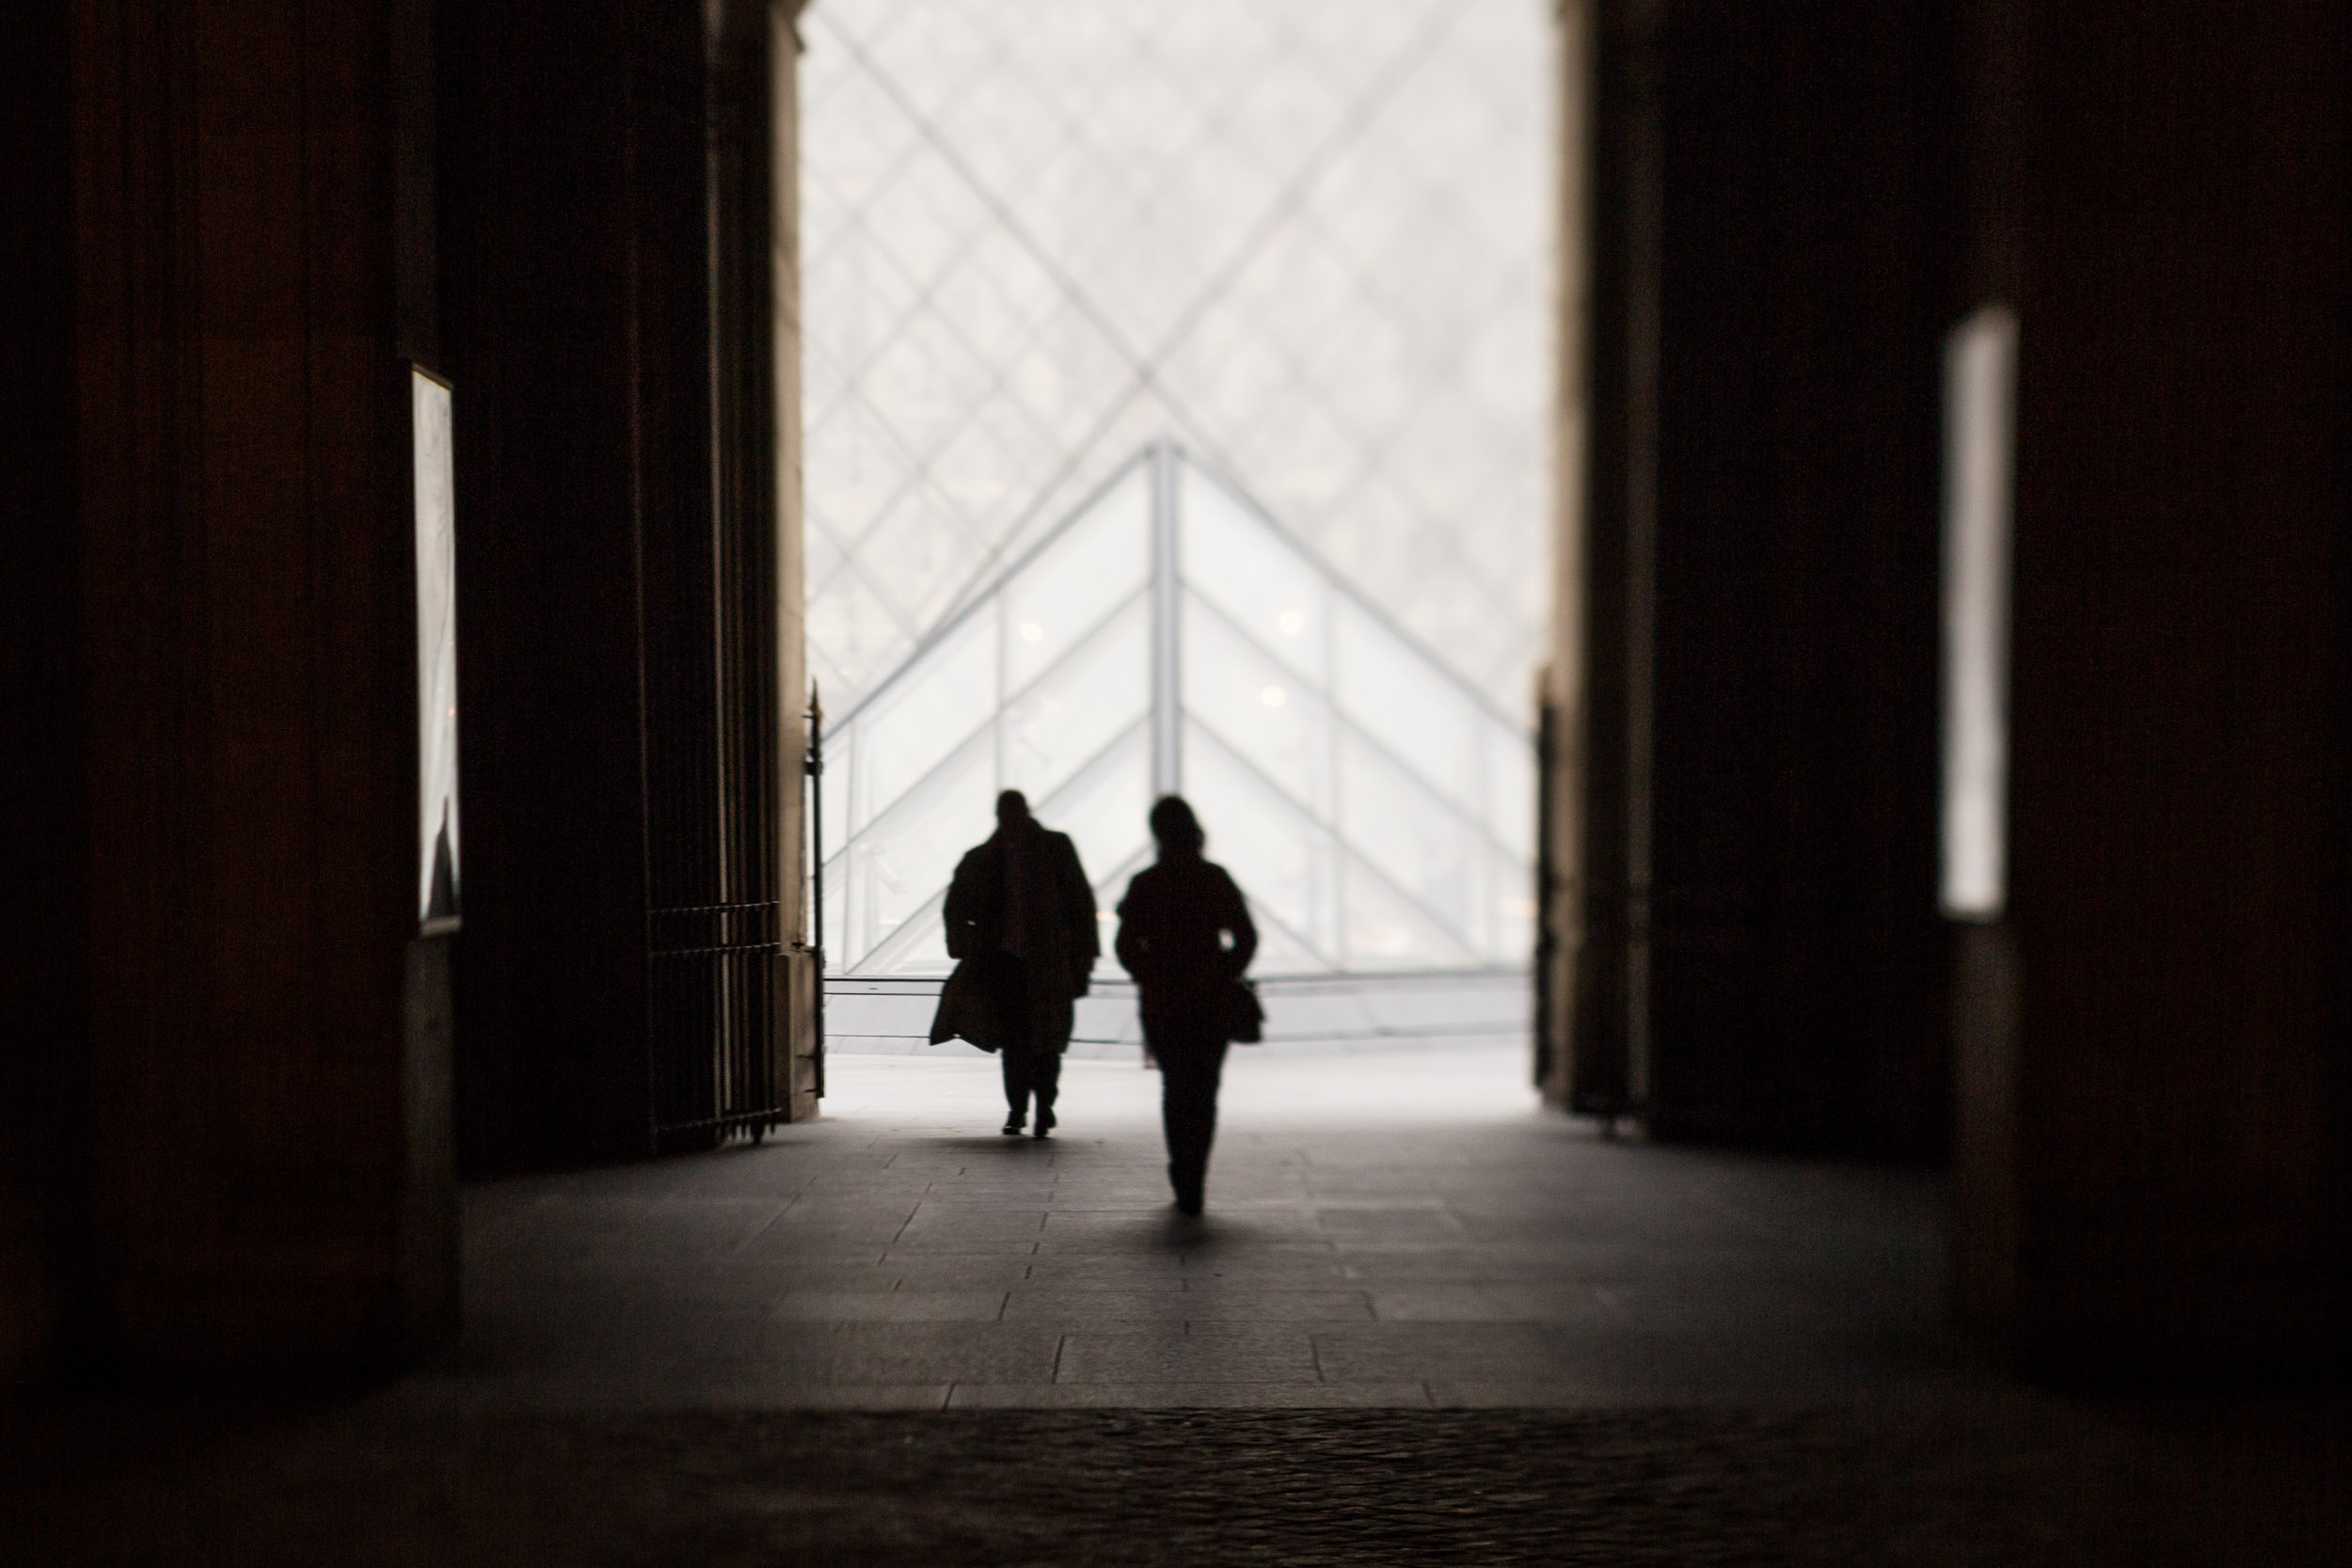 Paris-Louvre-couple-walking.jpg